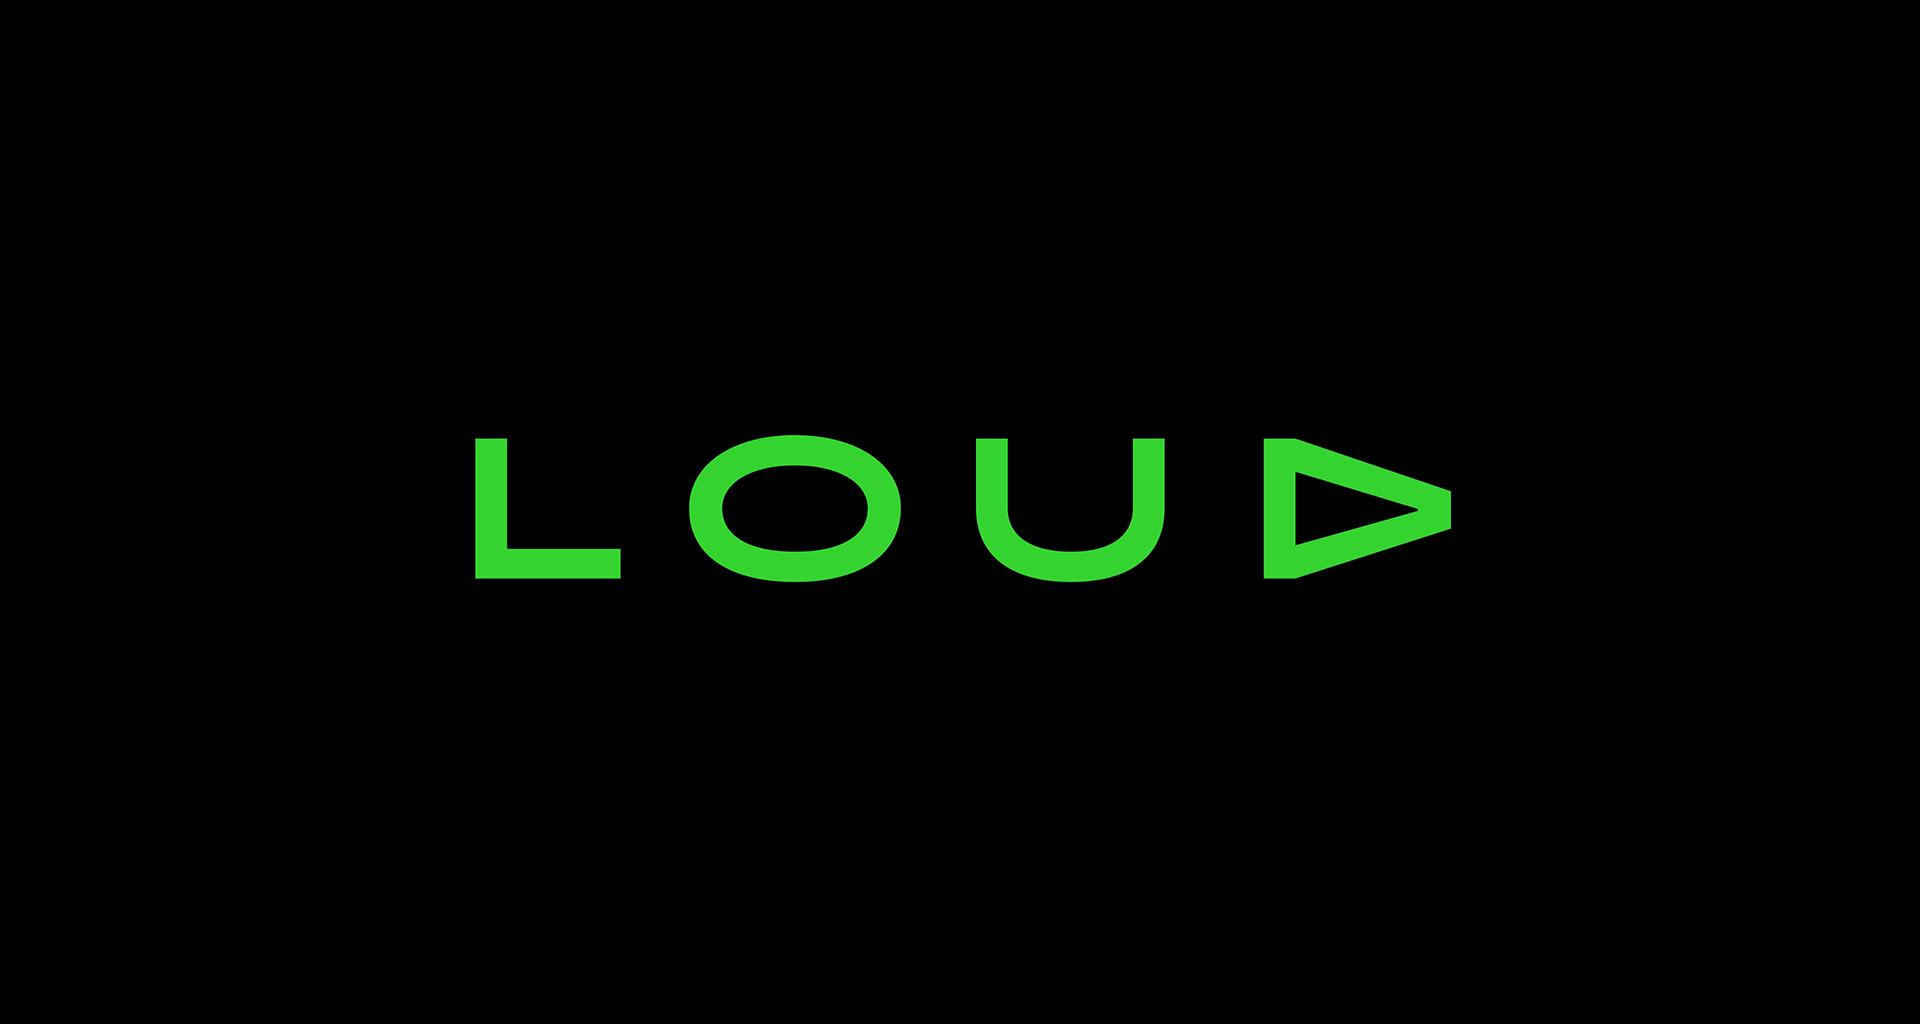 LOUD logotype